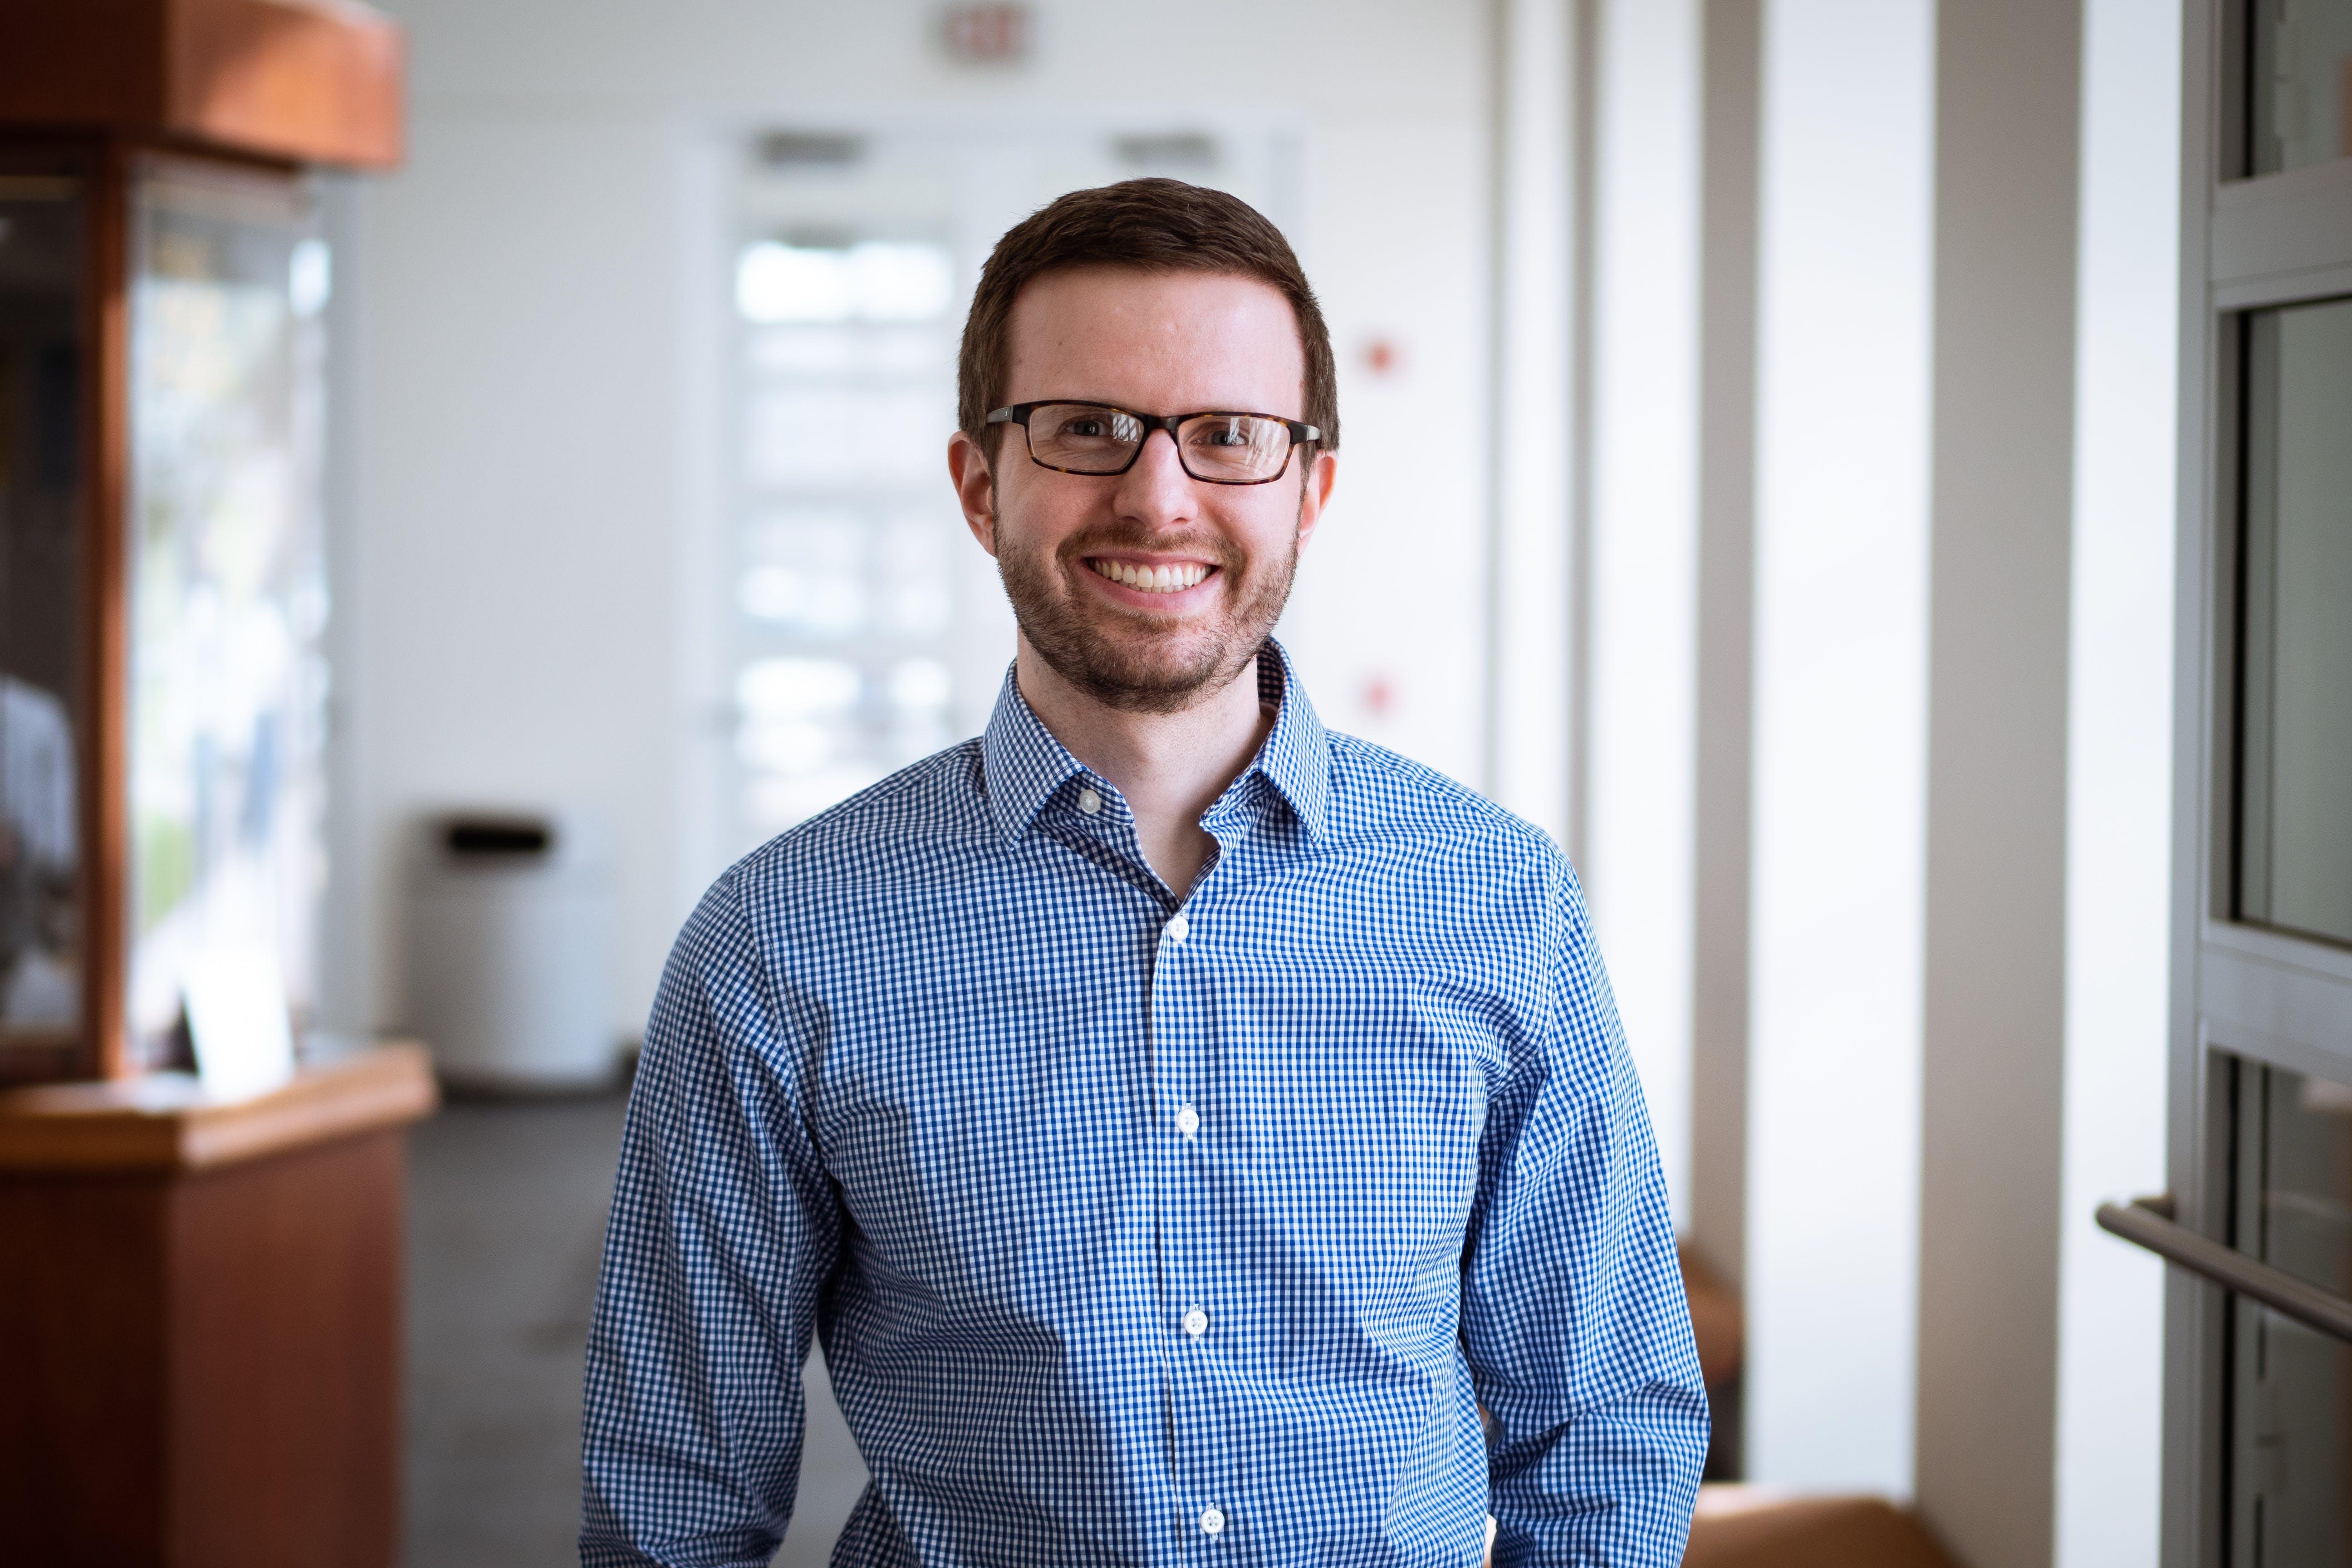 Bethel physics graduate Cory Lindh